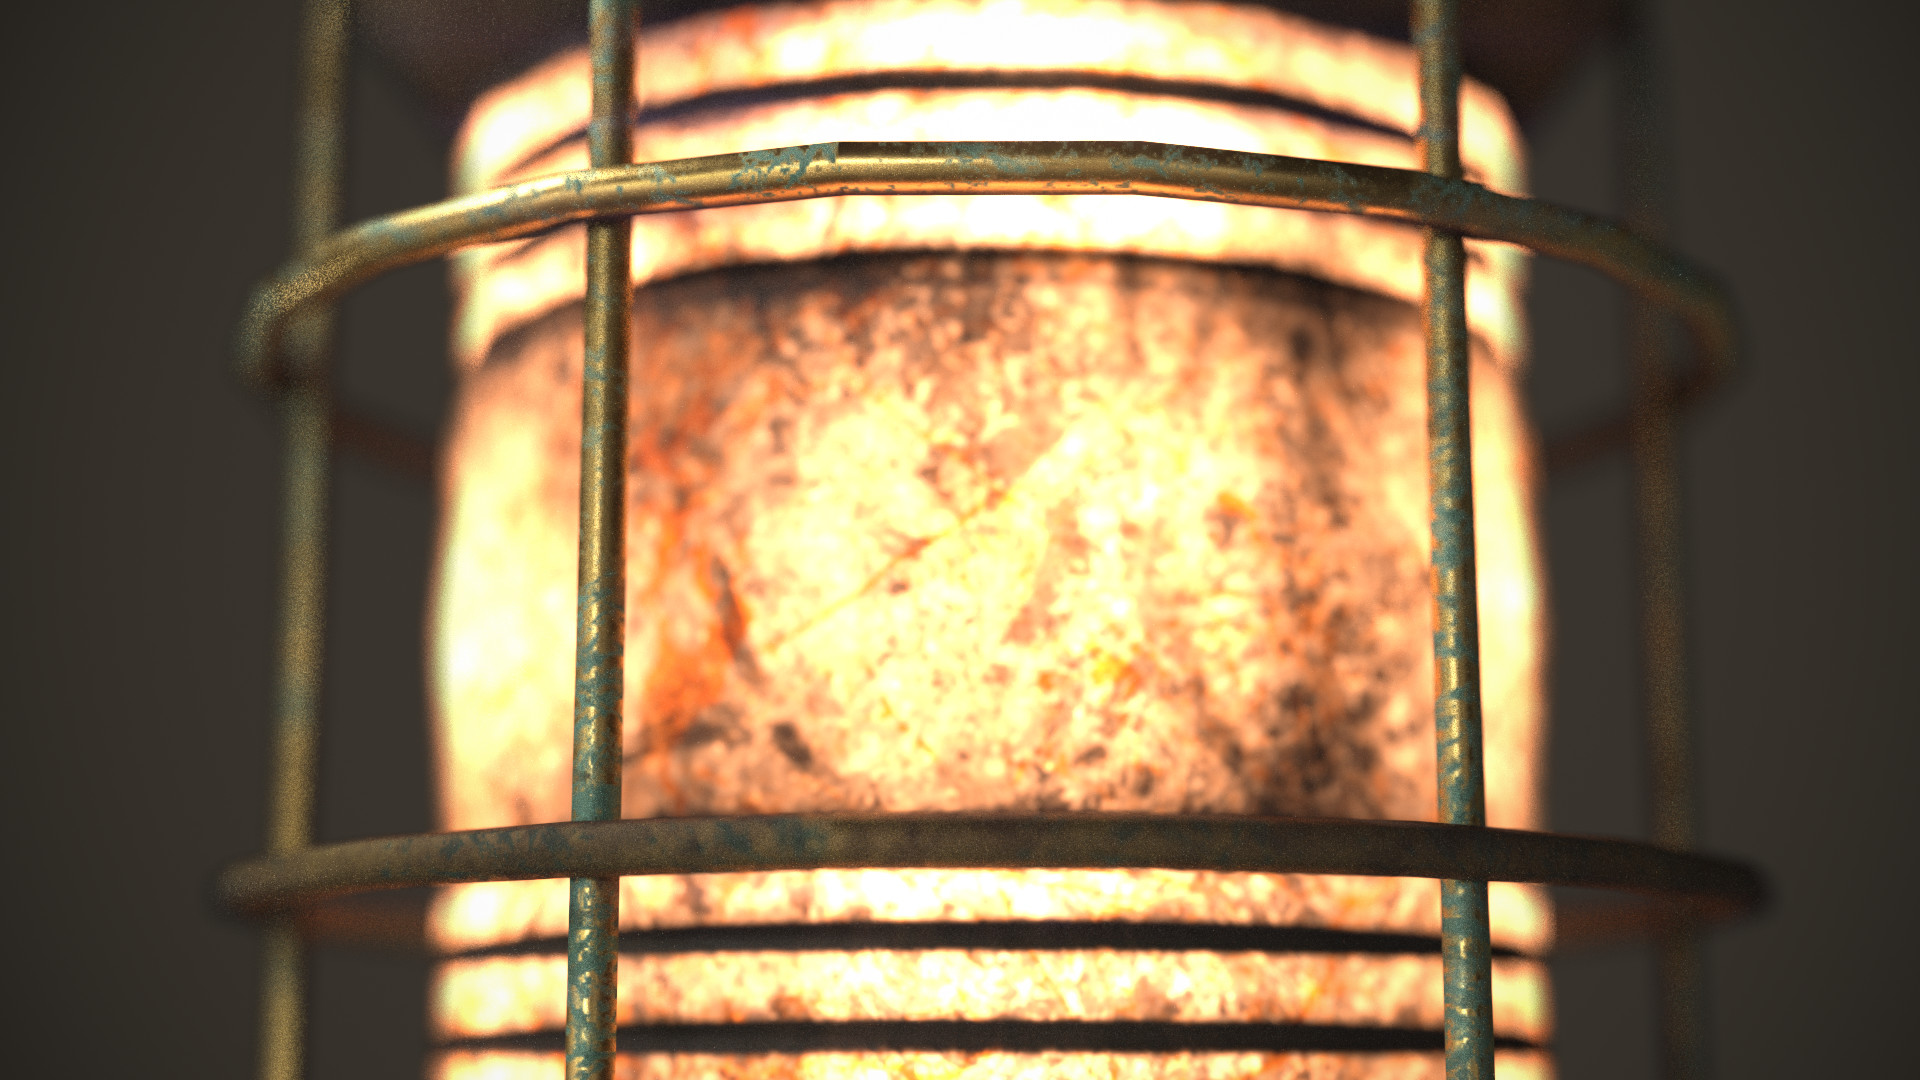 Leonardo iezzi 003 lantern